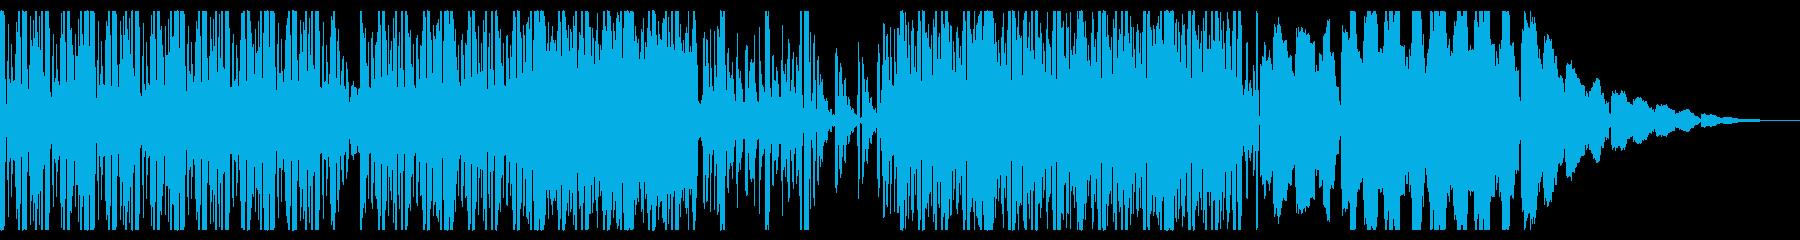 Glitch On Gridの再生済みの波形